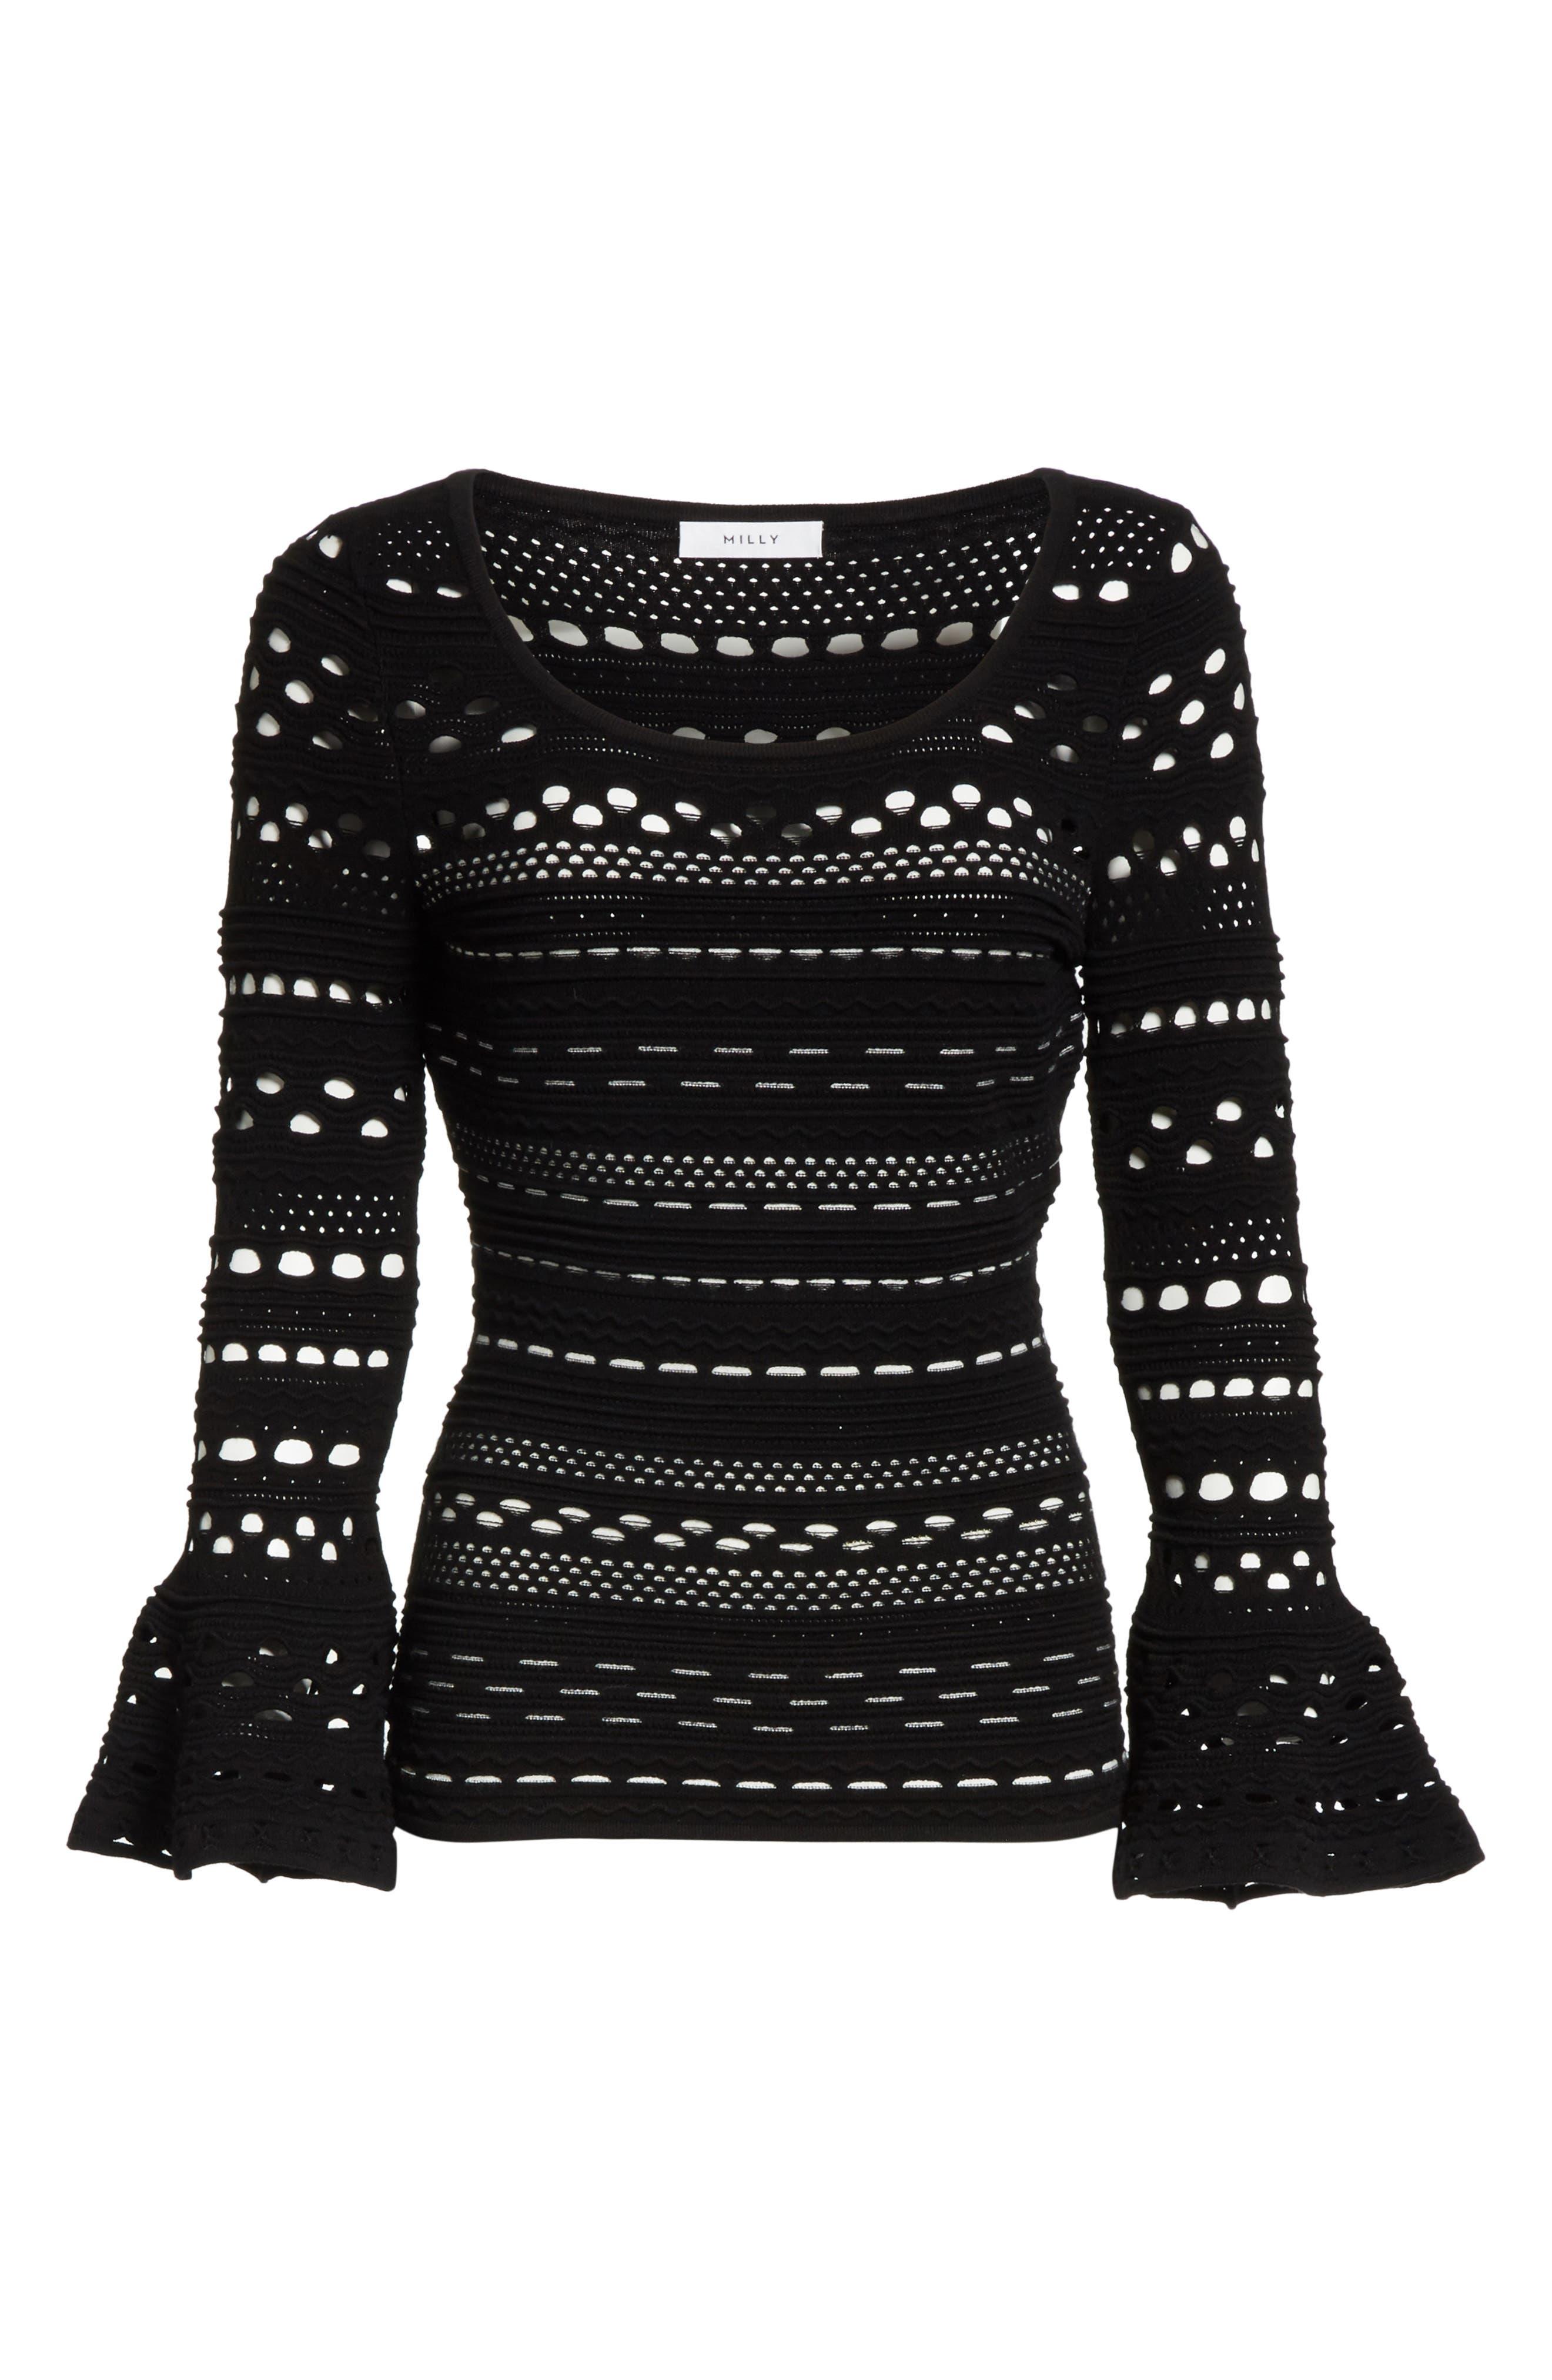 Lace Knit Top,                             Alternate thumbnail 6, color,                             Black/ White